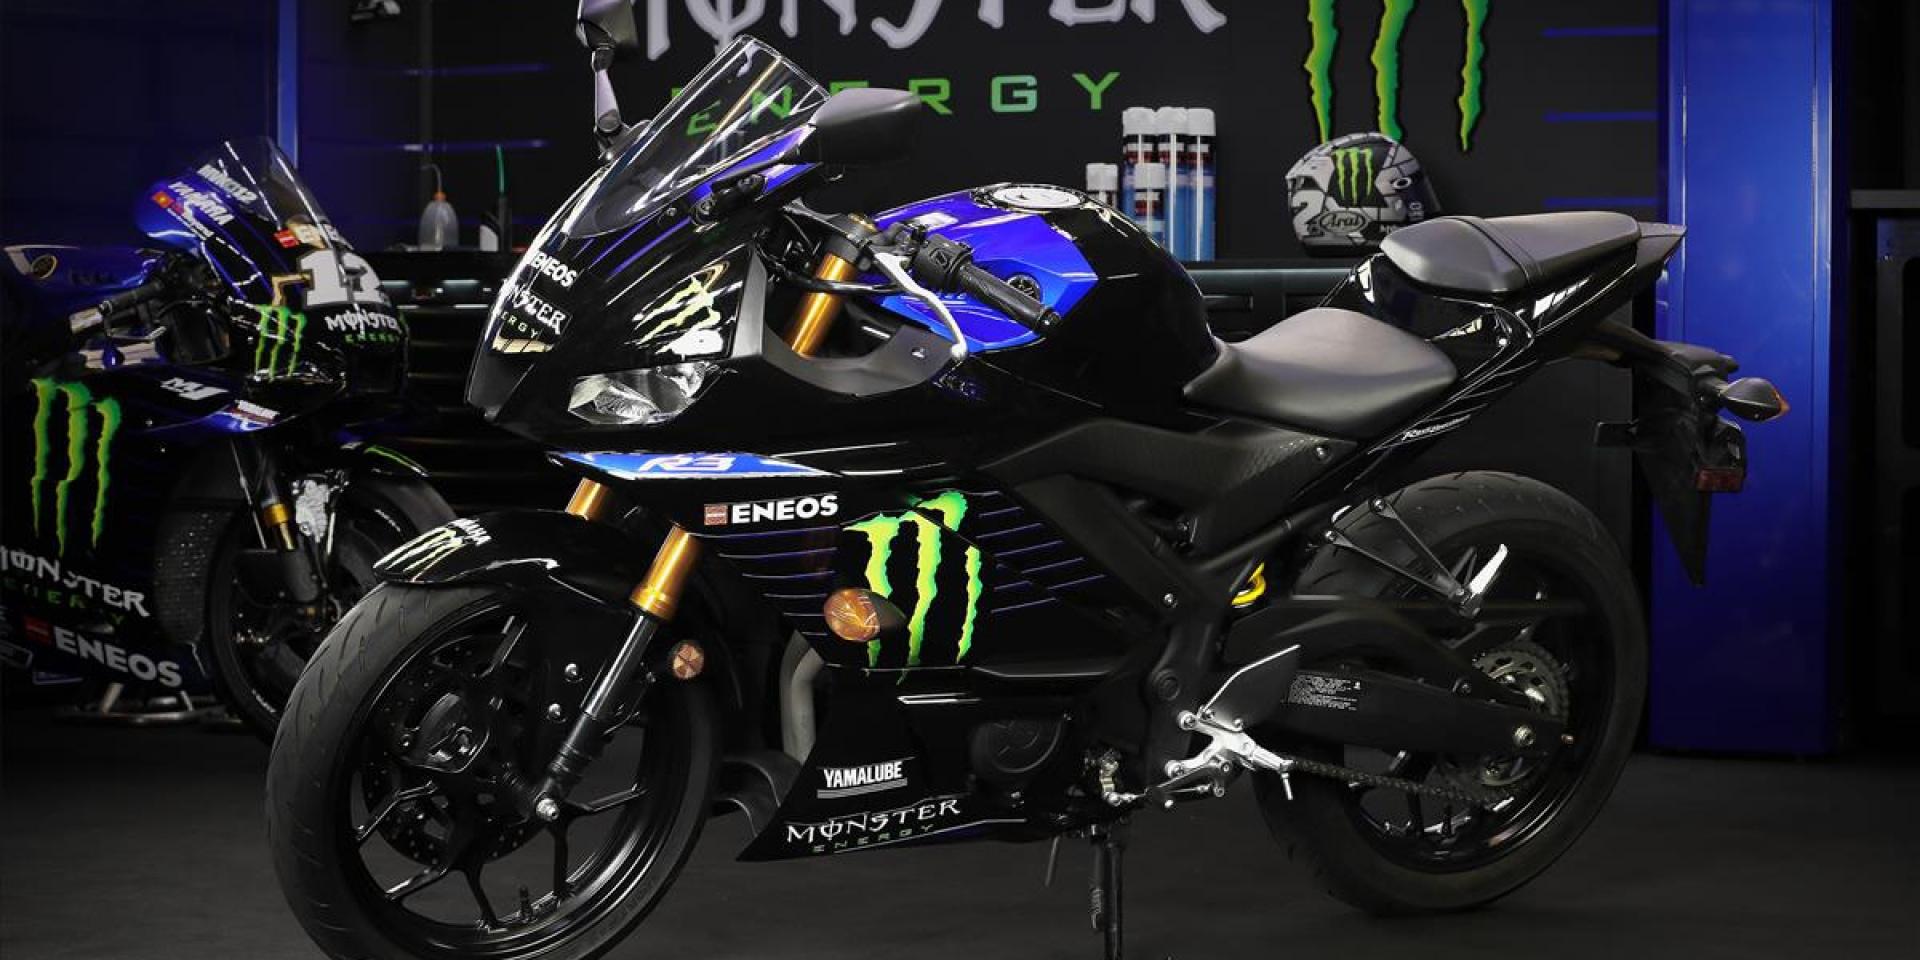 GP廠隊貼紙多8000!「YZF-R3 Monster Energy Yamaha MotoGP Edition」271,000元開始販售